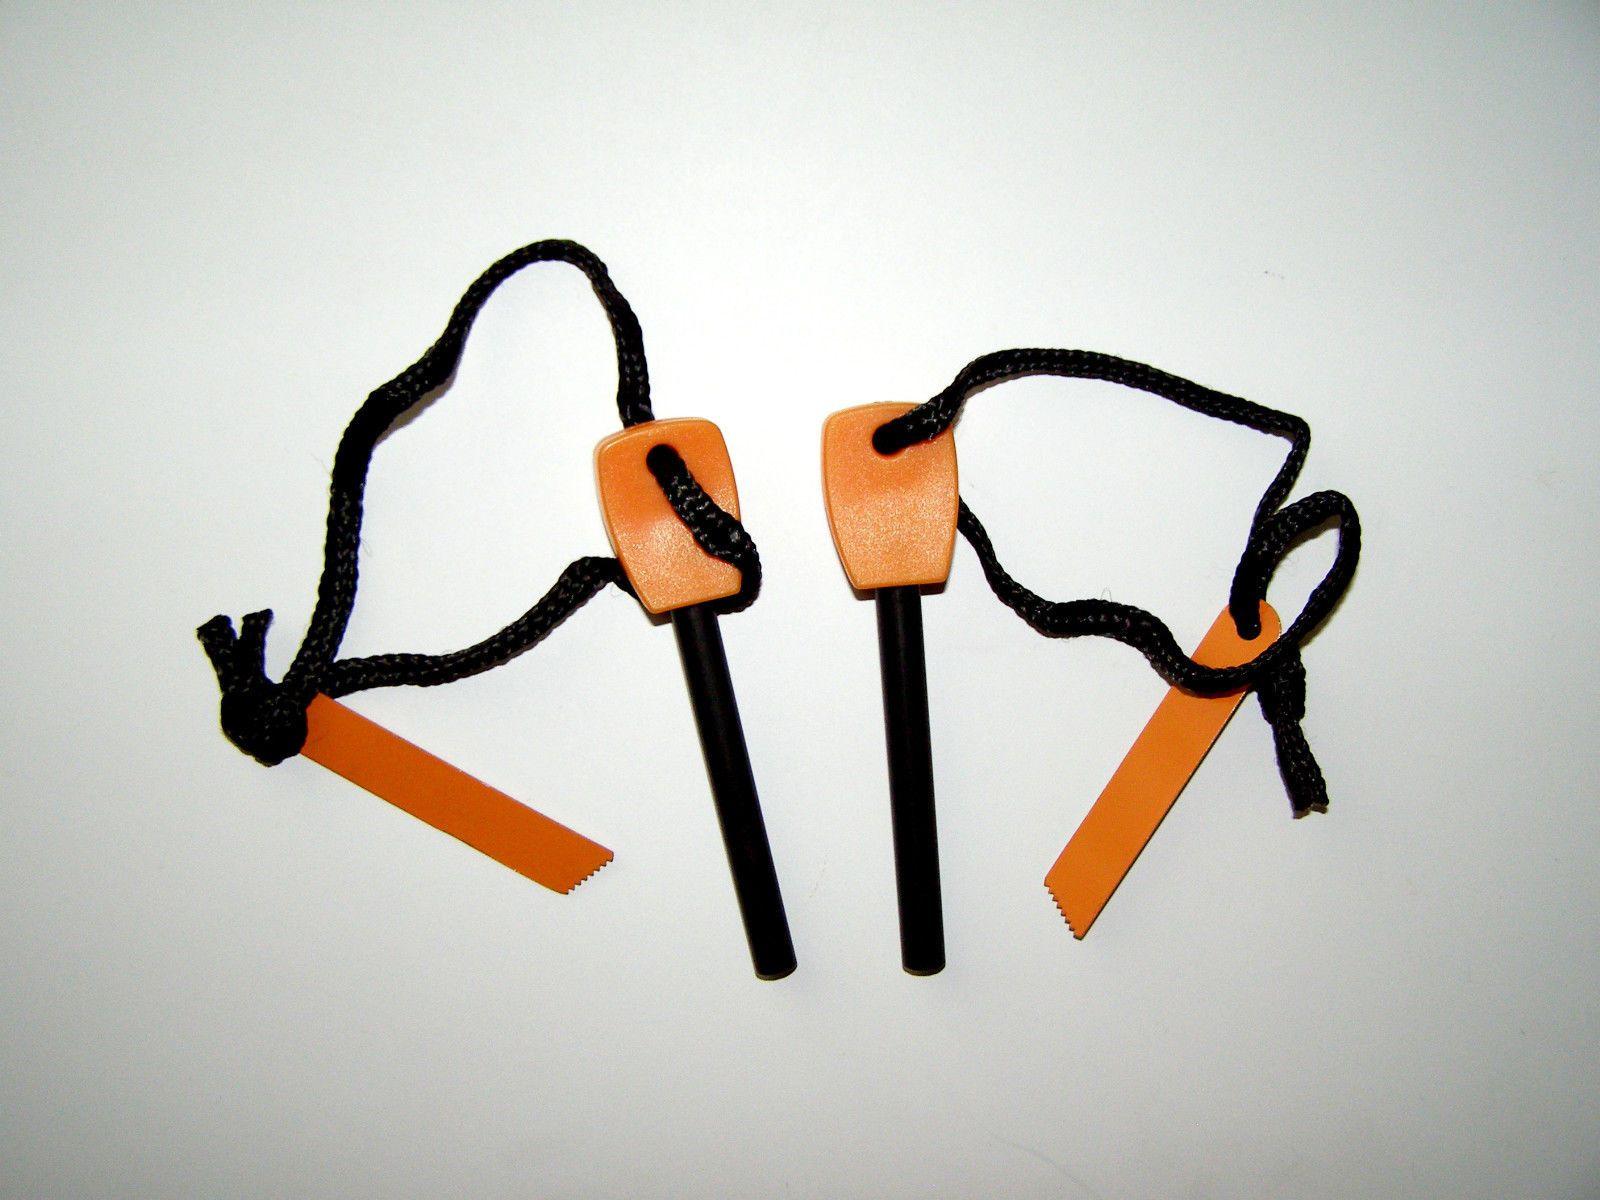 2 NEW Large Outdoor Survival Flint Steel Magnesium Rod Fire Striker Starter Kits